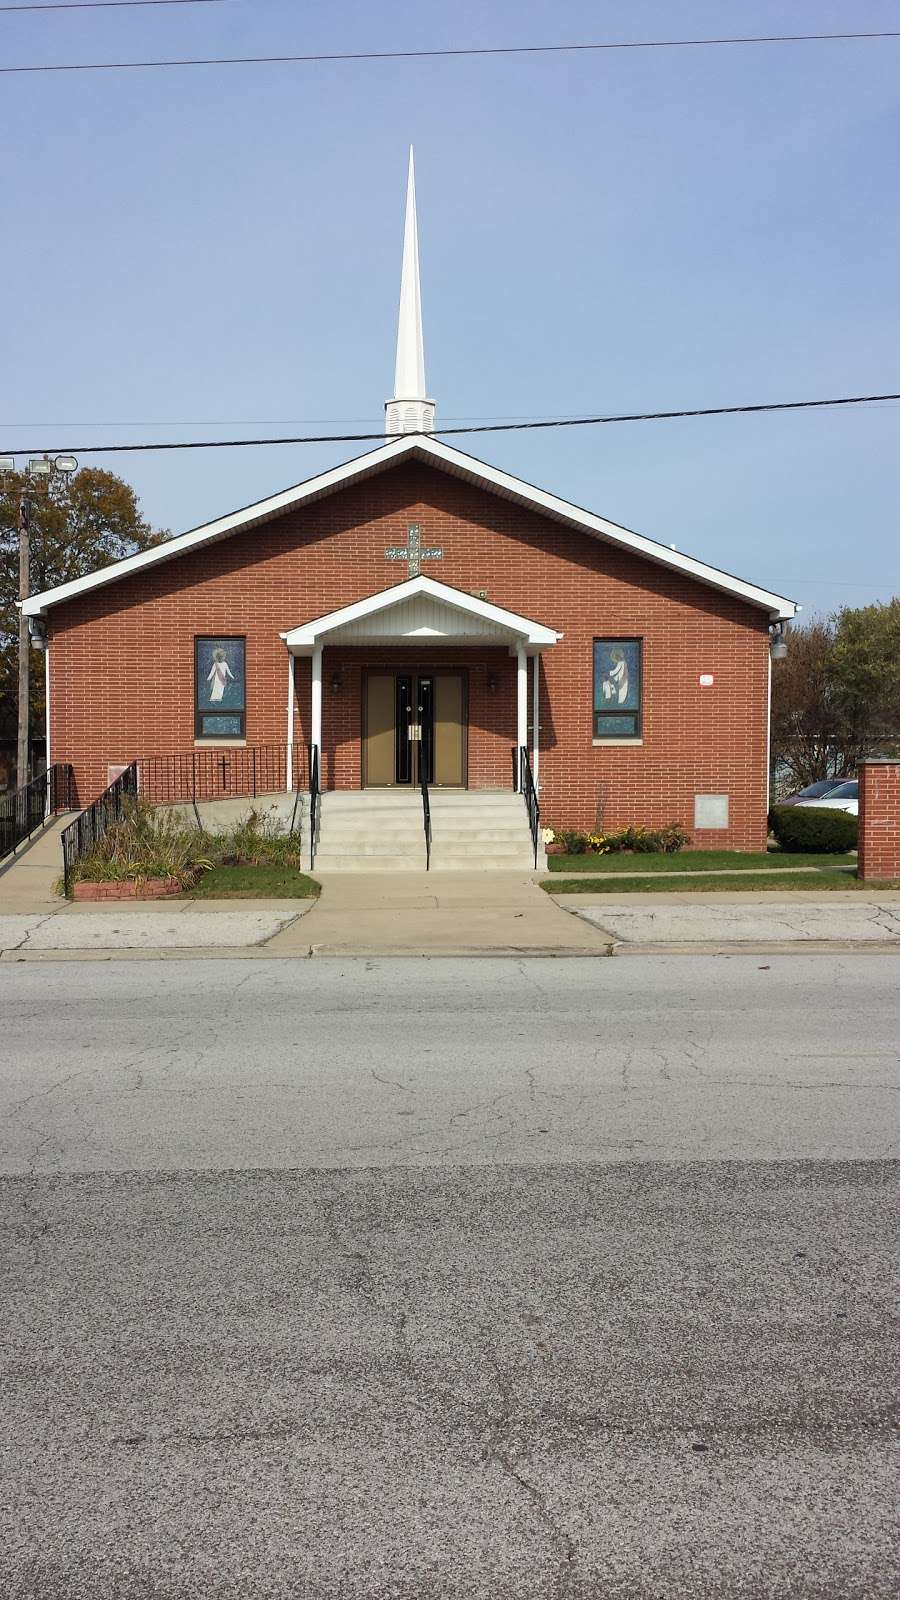 New Revelation Baptist Church - church    Photo 1 of 3   Address: 3140 W 21st Ave, Gary, IN 46404, USA   Phone: (219) 949-2225